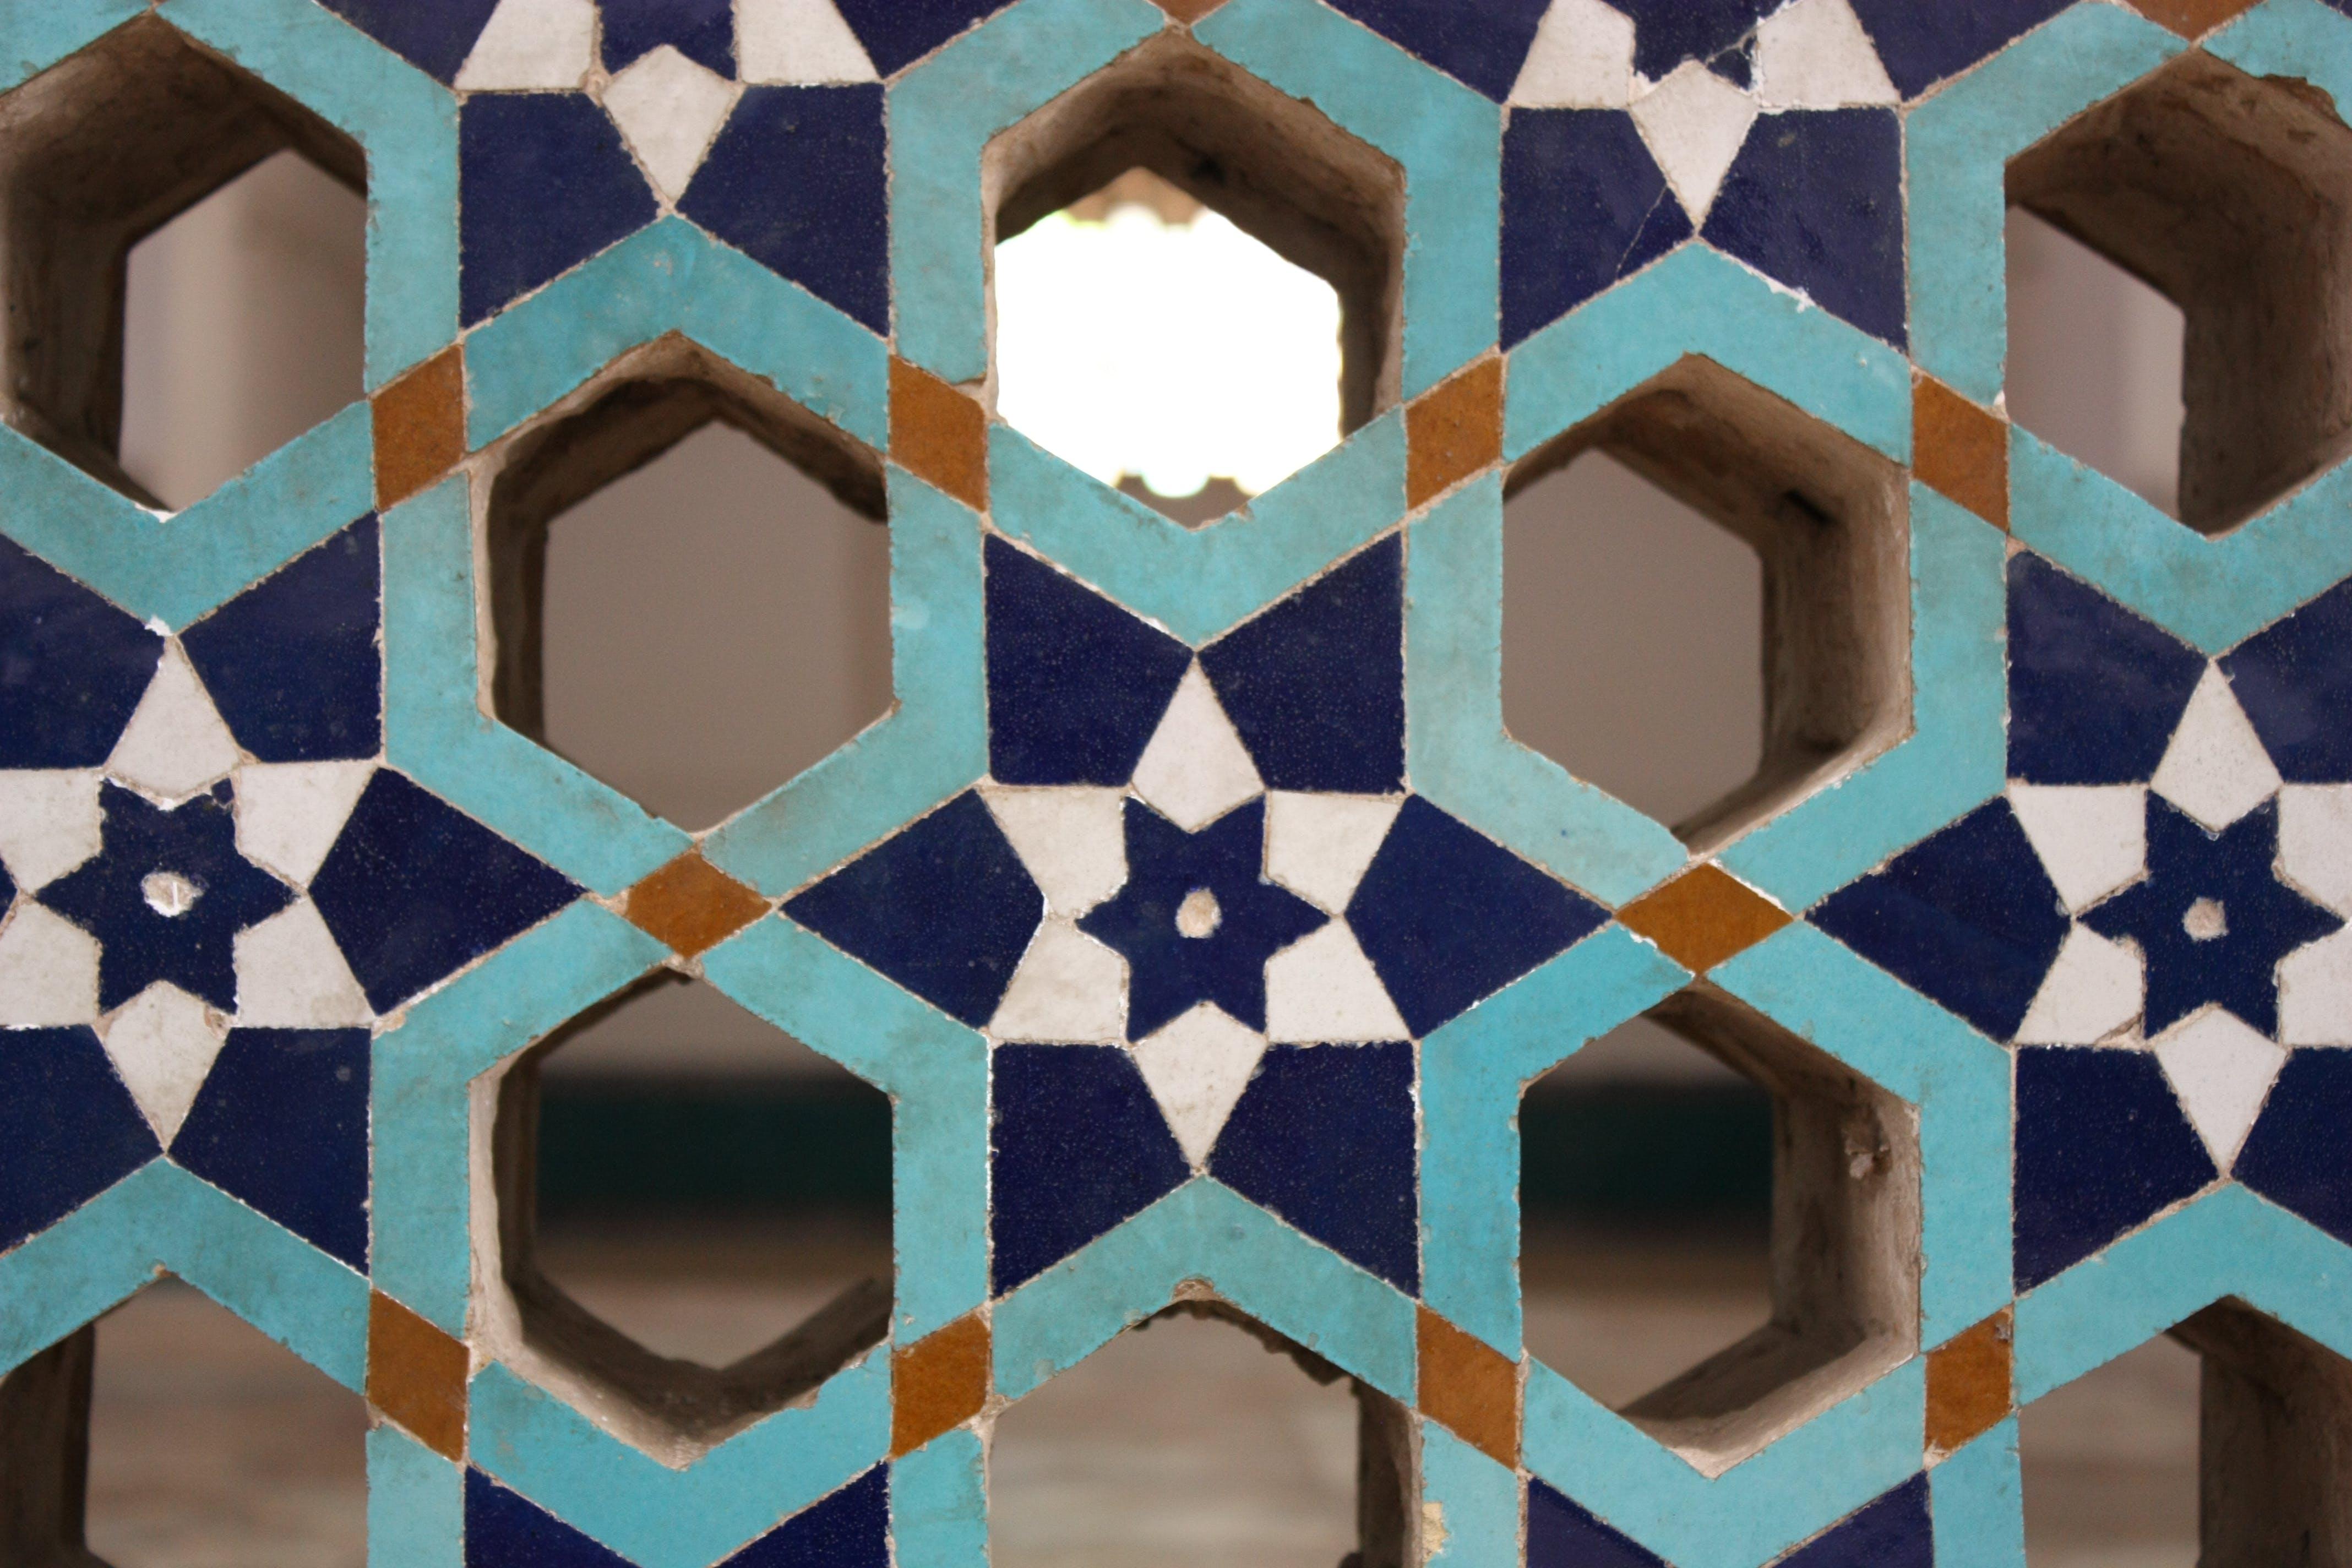 Blue and Light-blue Wooden Organizer